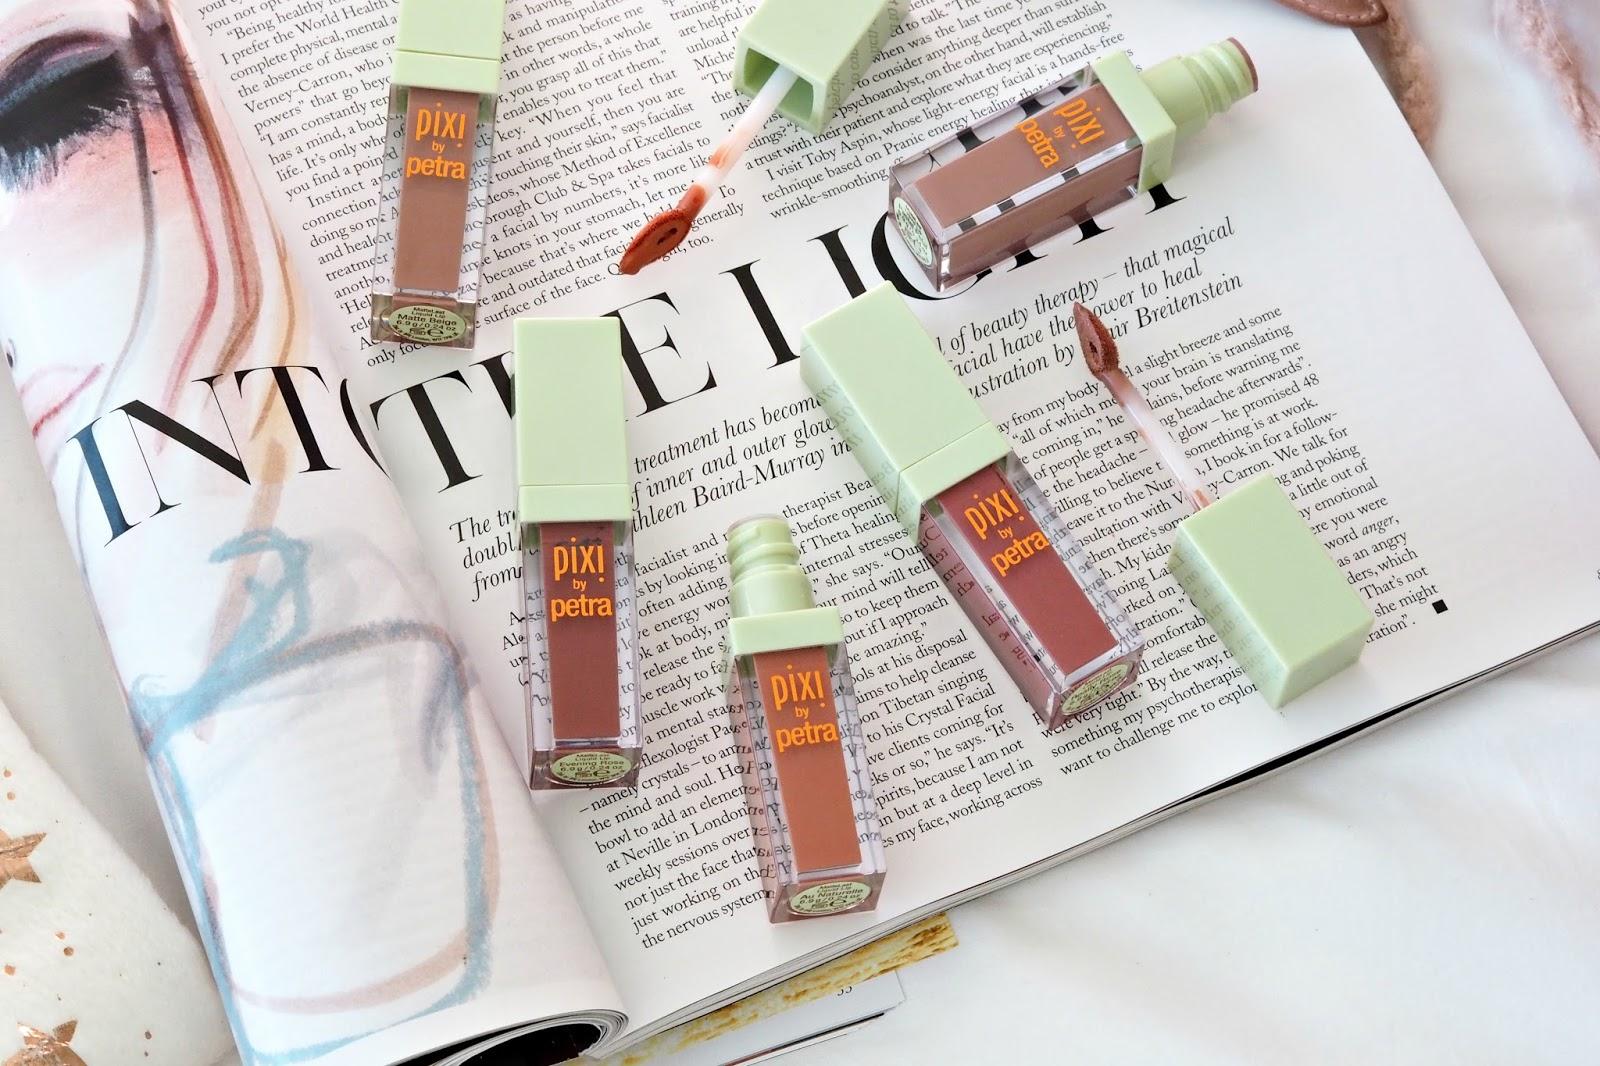 PIXI MatteLast Liquid Lipstick Review and swatches